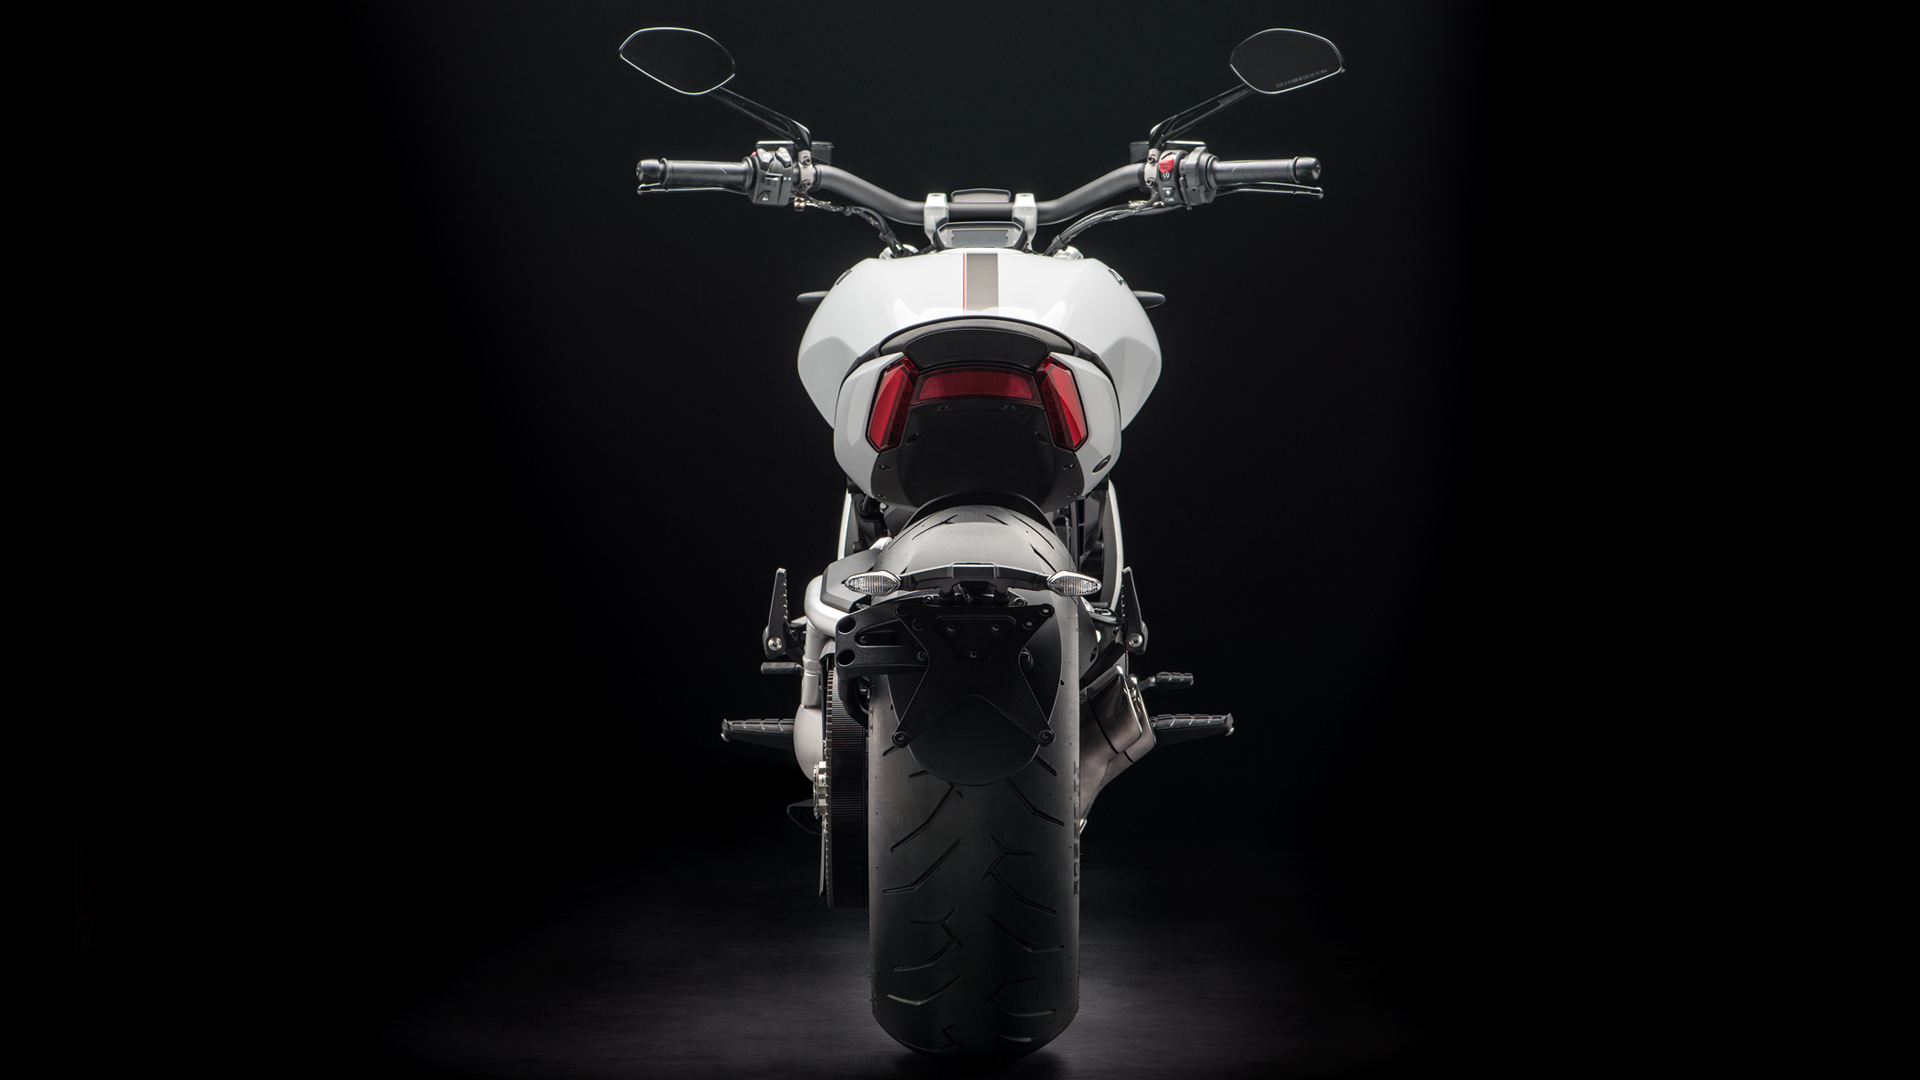 МОТОЦИКЛ DUCATI DIAVEL S ICEBERG ― Артмото - купить квадроцикл в украине и харькове, мотоцикл, снегоход, скутер, мопед, электромобиль